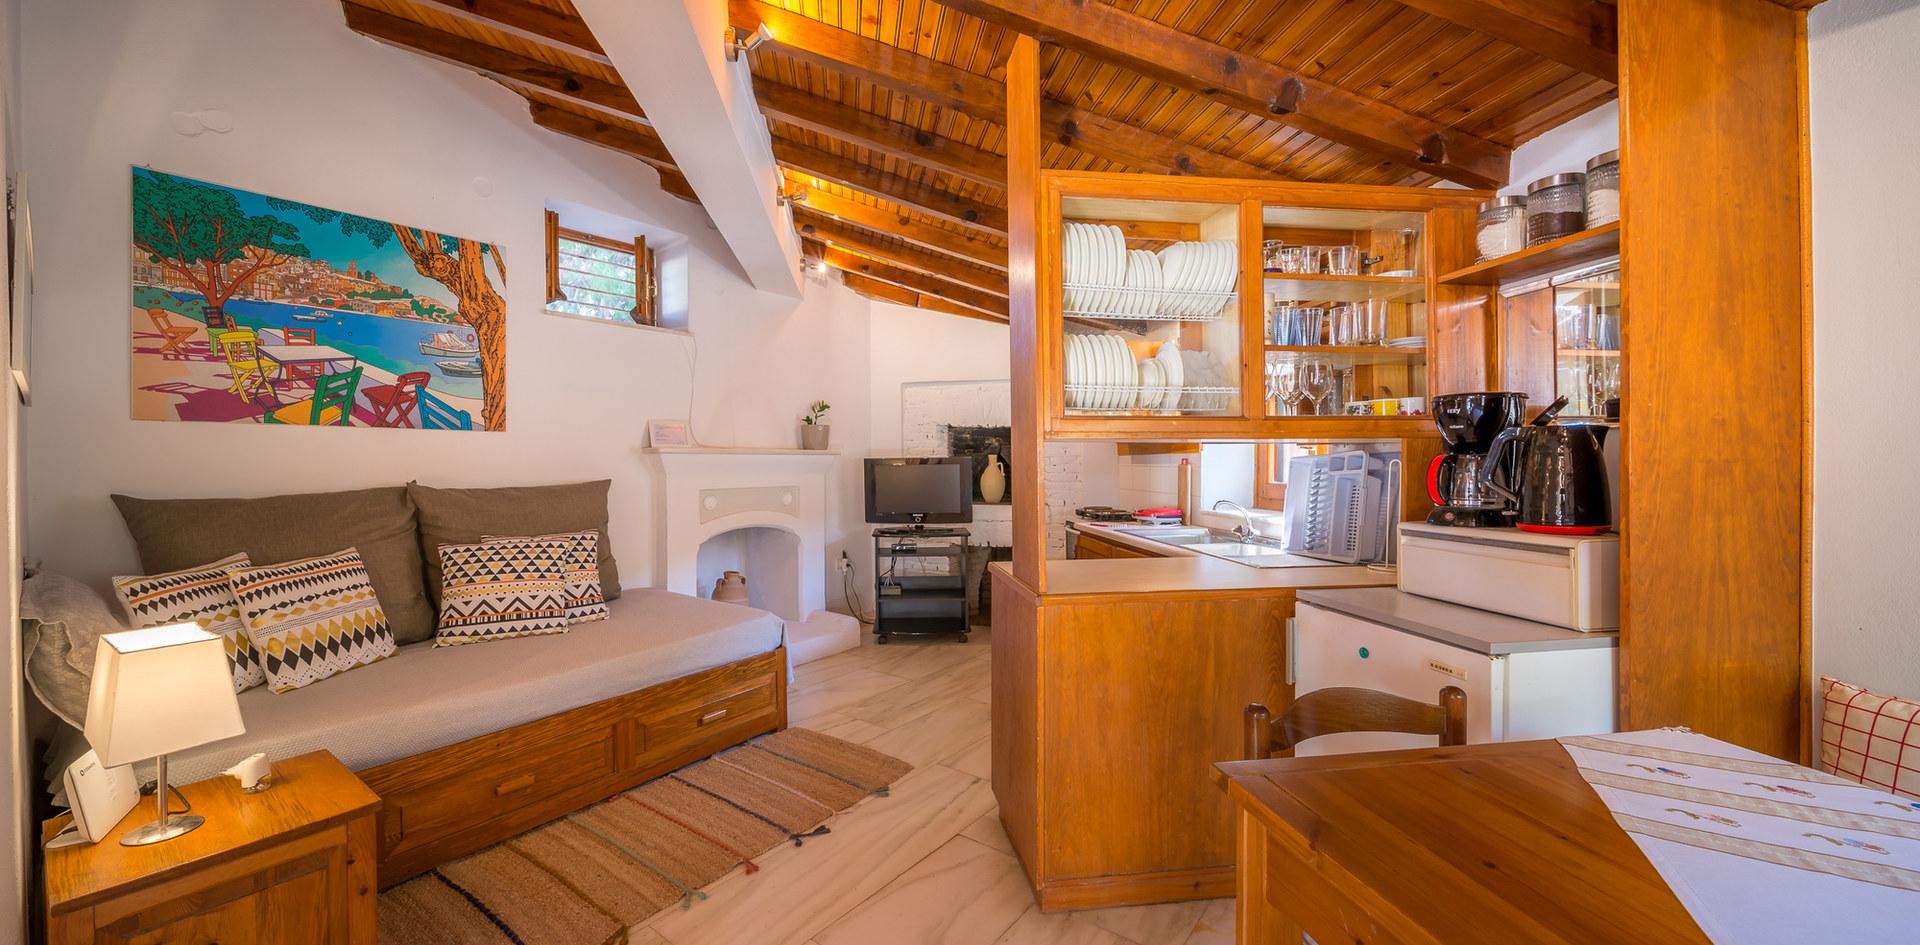 Aegina property for rent